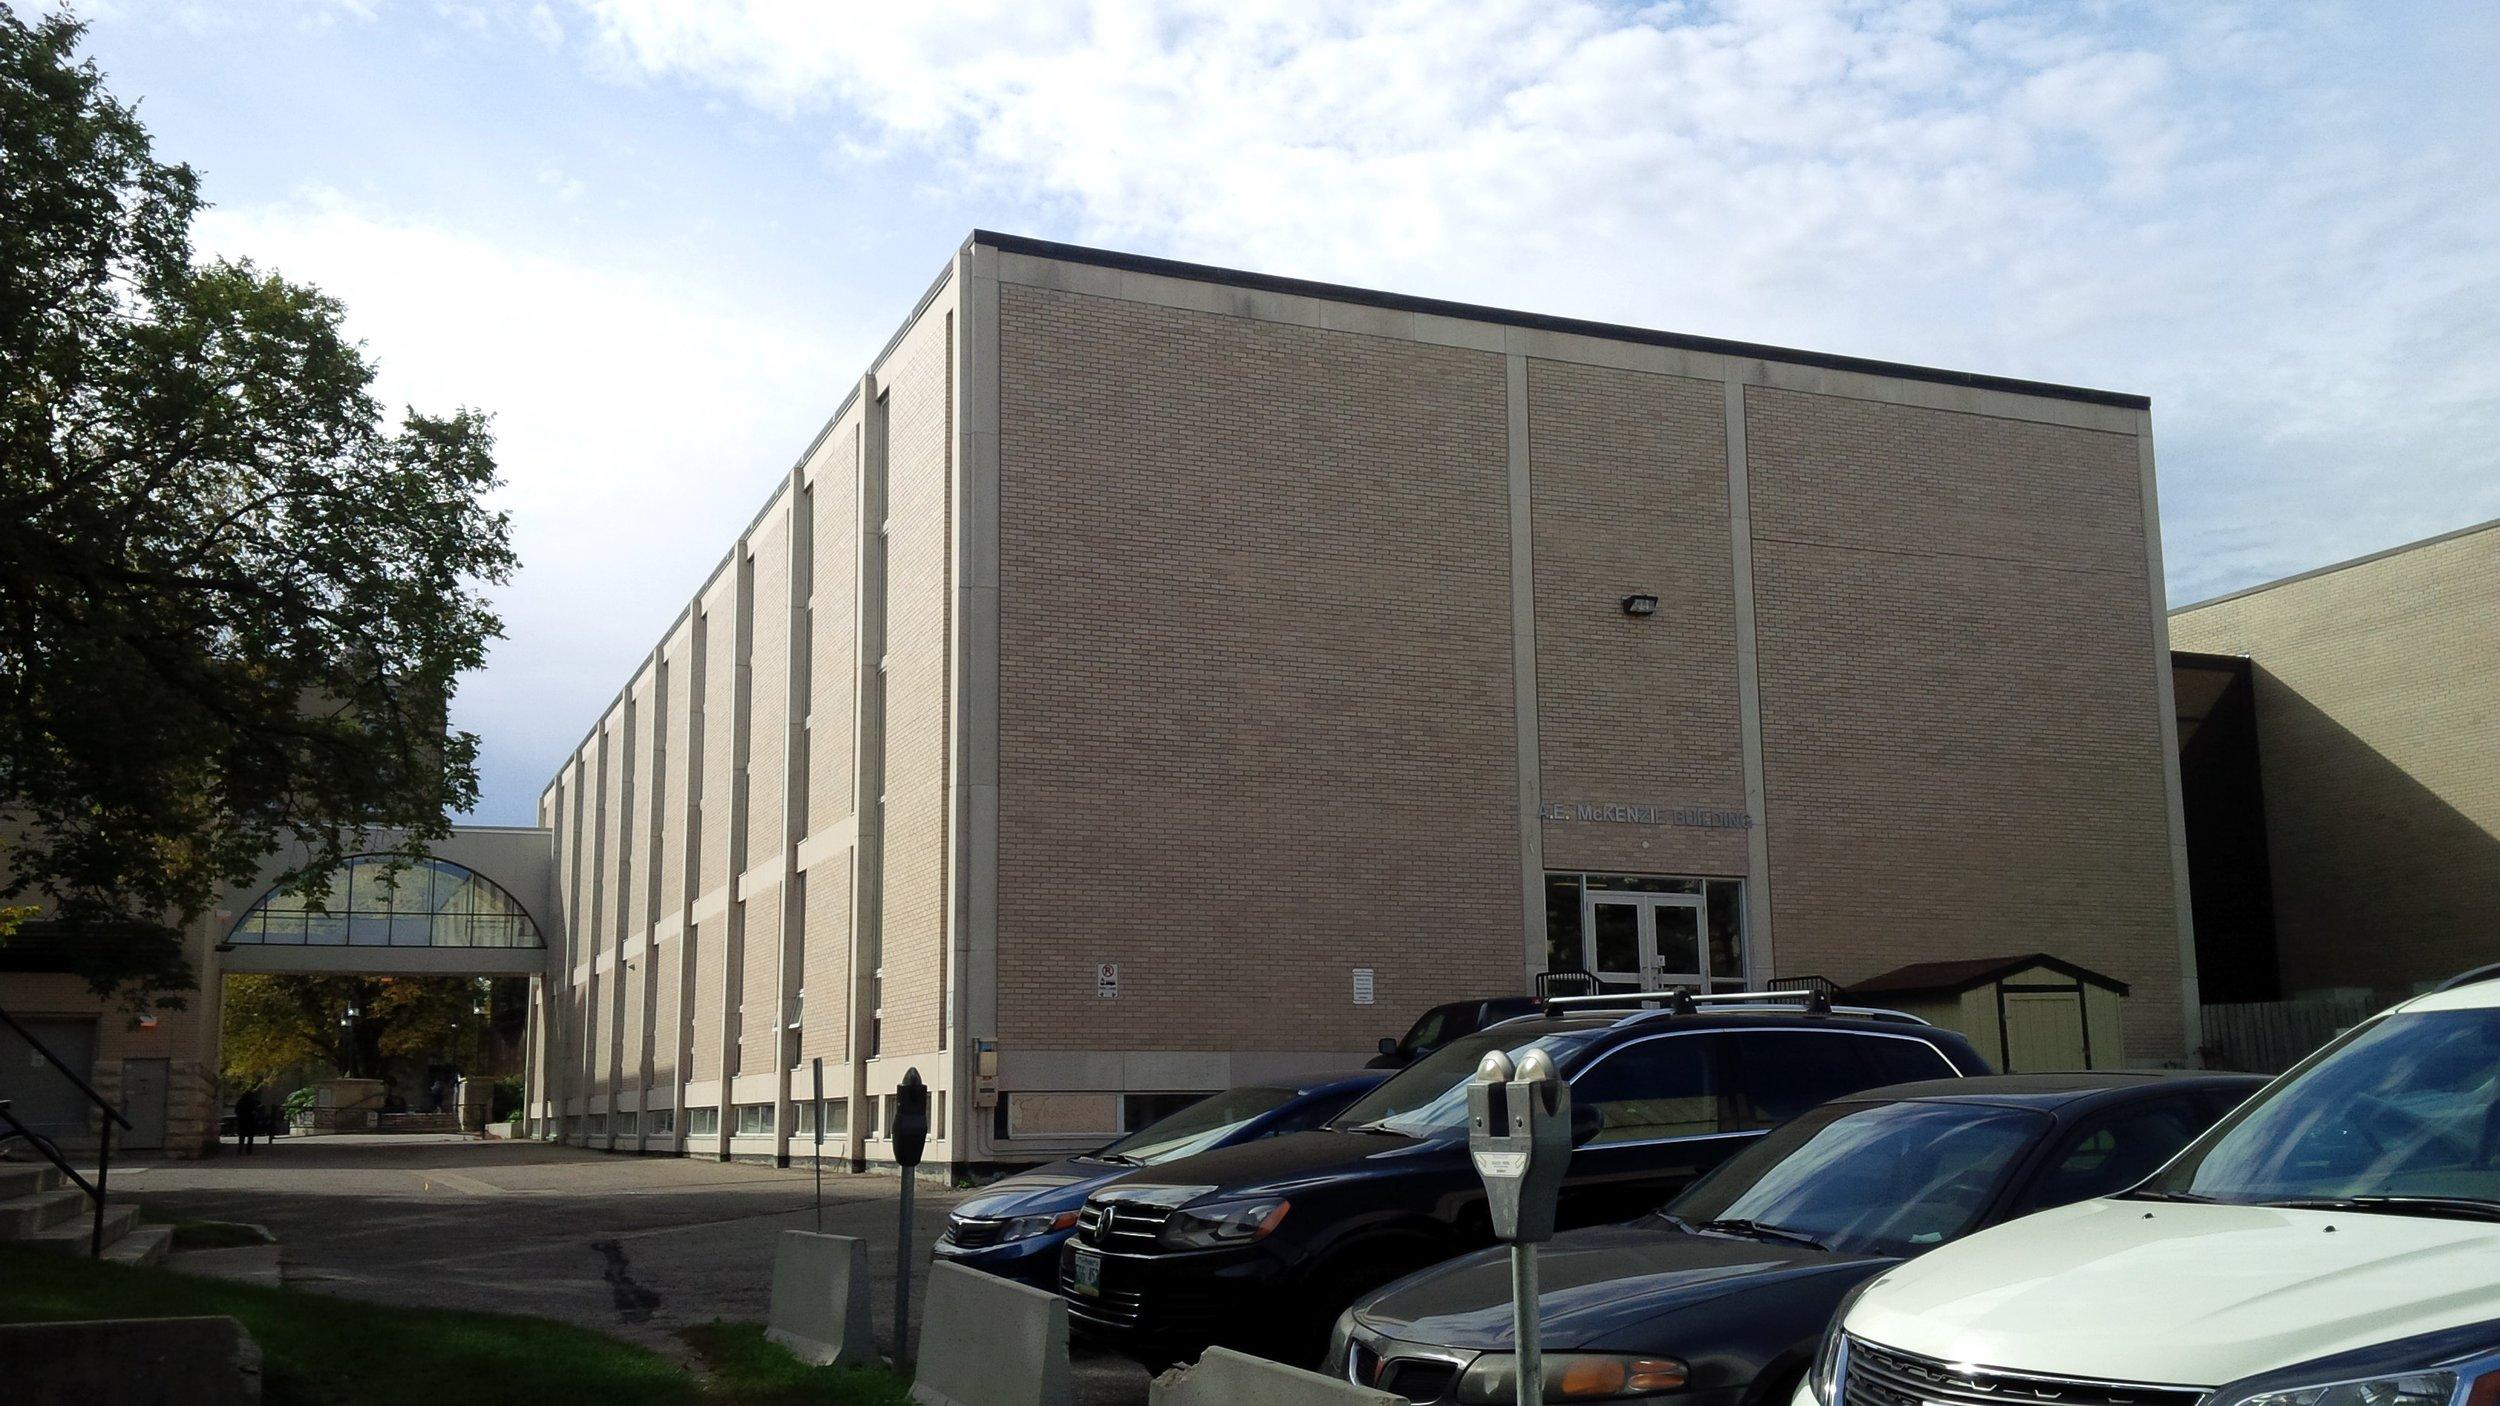 The A. E. McKenzie building, home of Student Services. (Logan Praznik/The Quill)